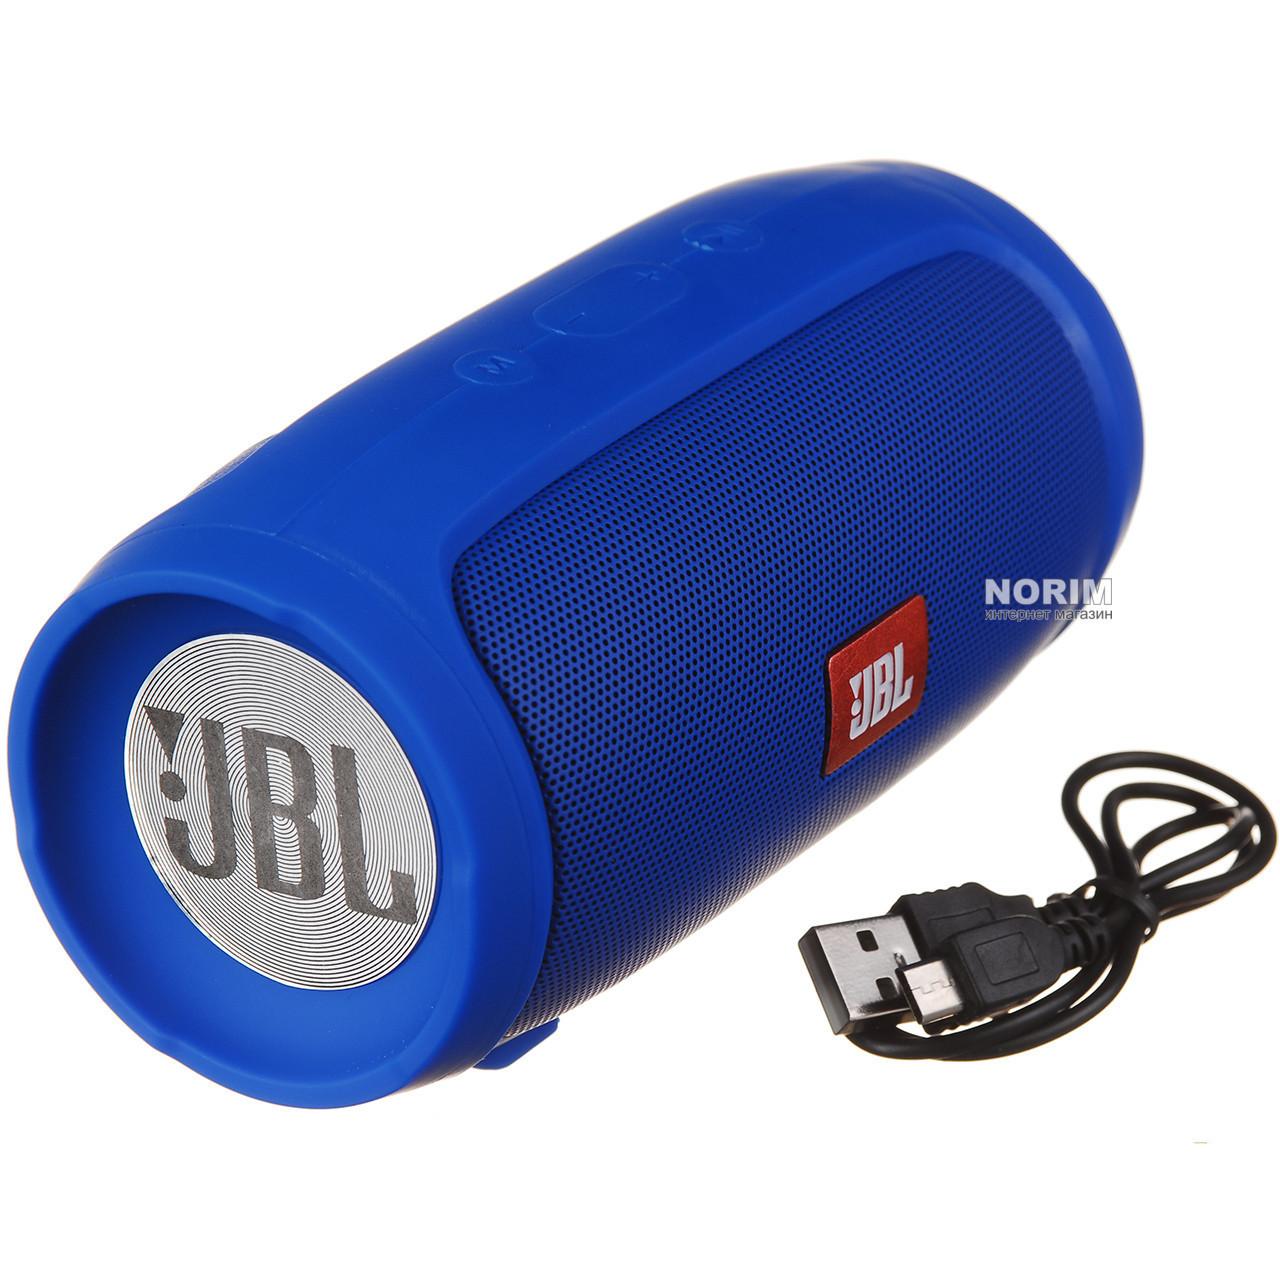 Портативная блютуз колонка JBL Charge 3 MINI колонка с USB,SD,FM